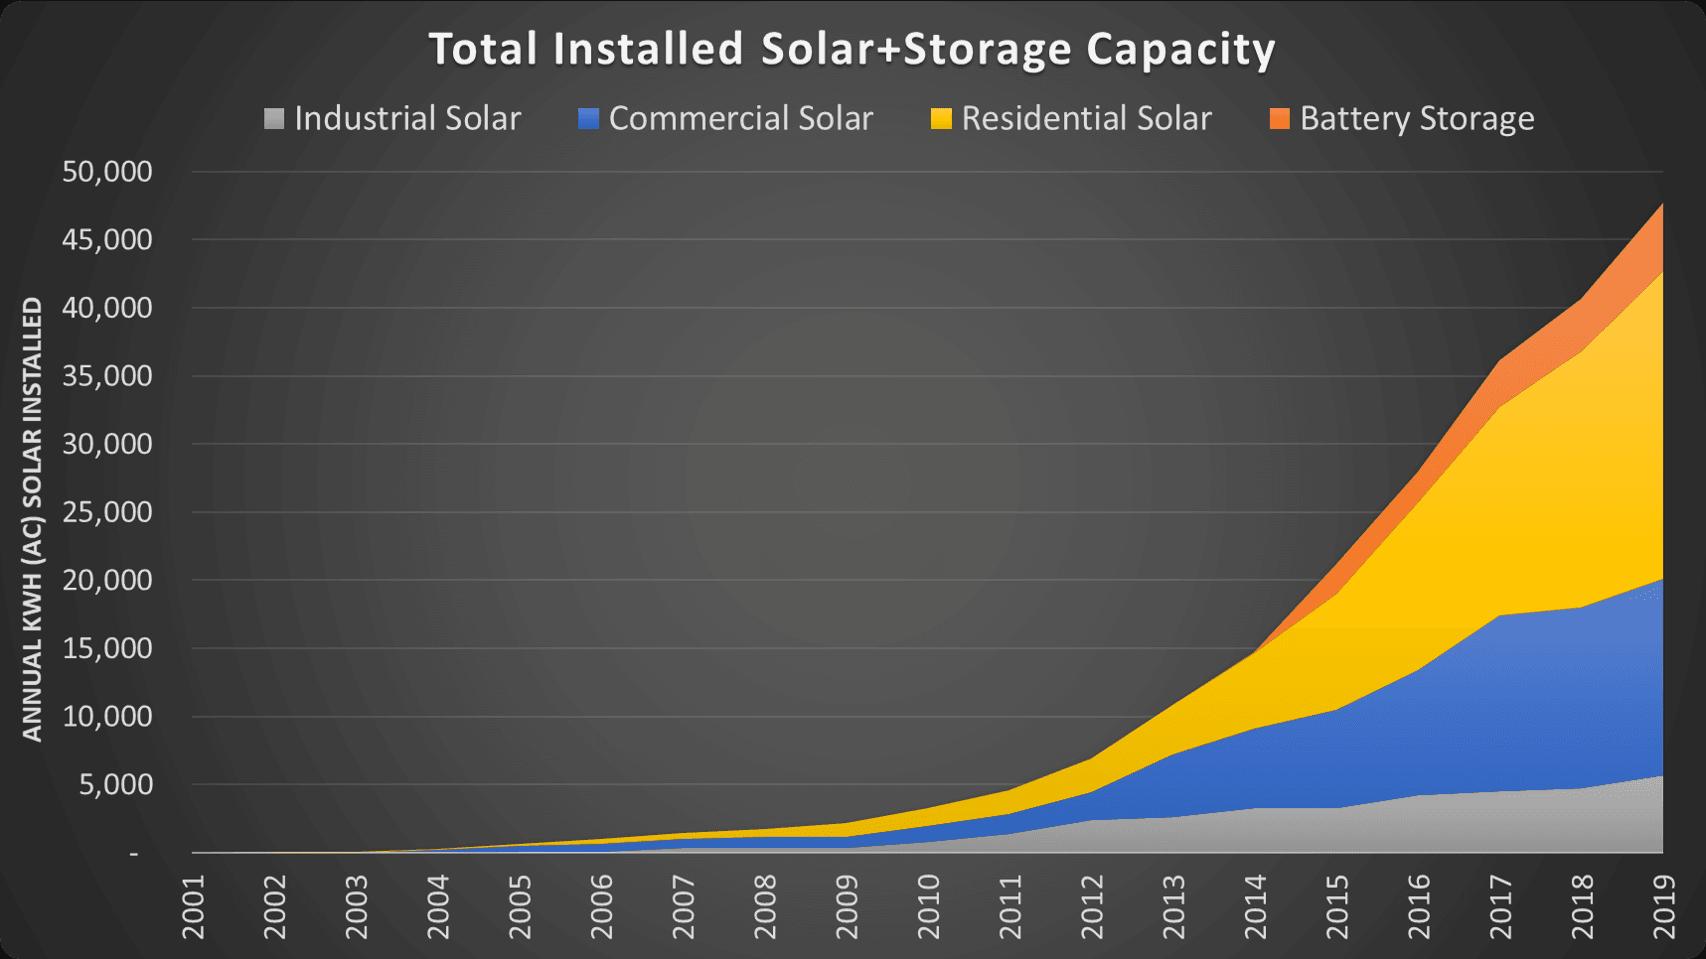 City of Fremont, California, Fremont Solar Storage through 2019